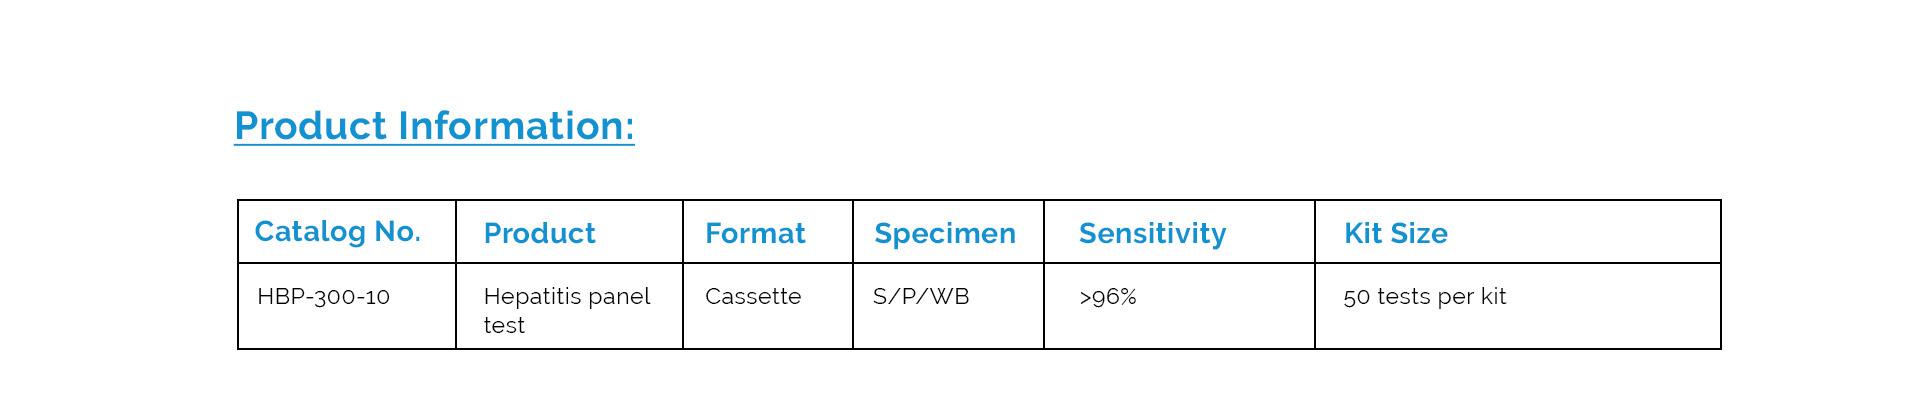 HEPATITIS-B-PANEL-TEST